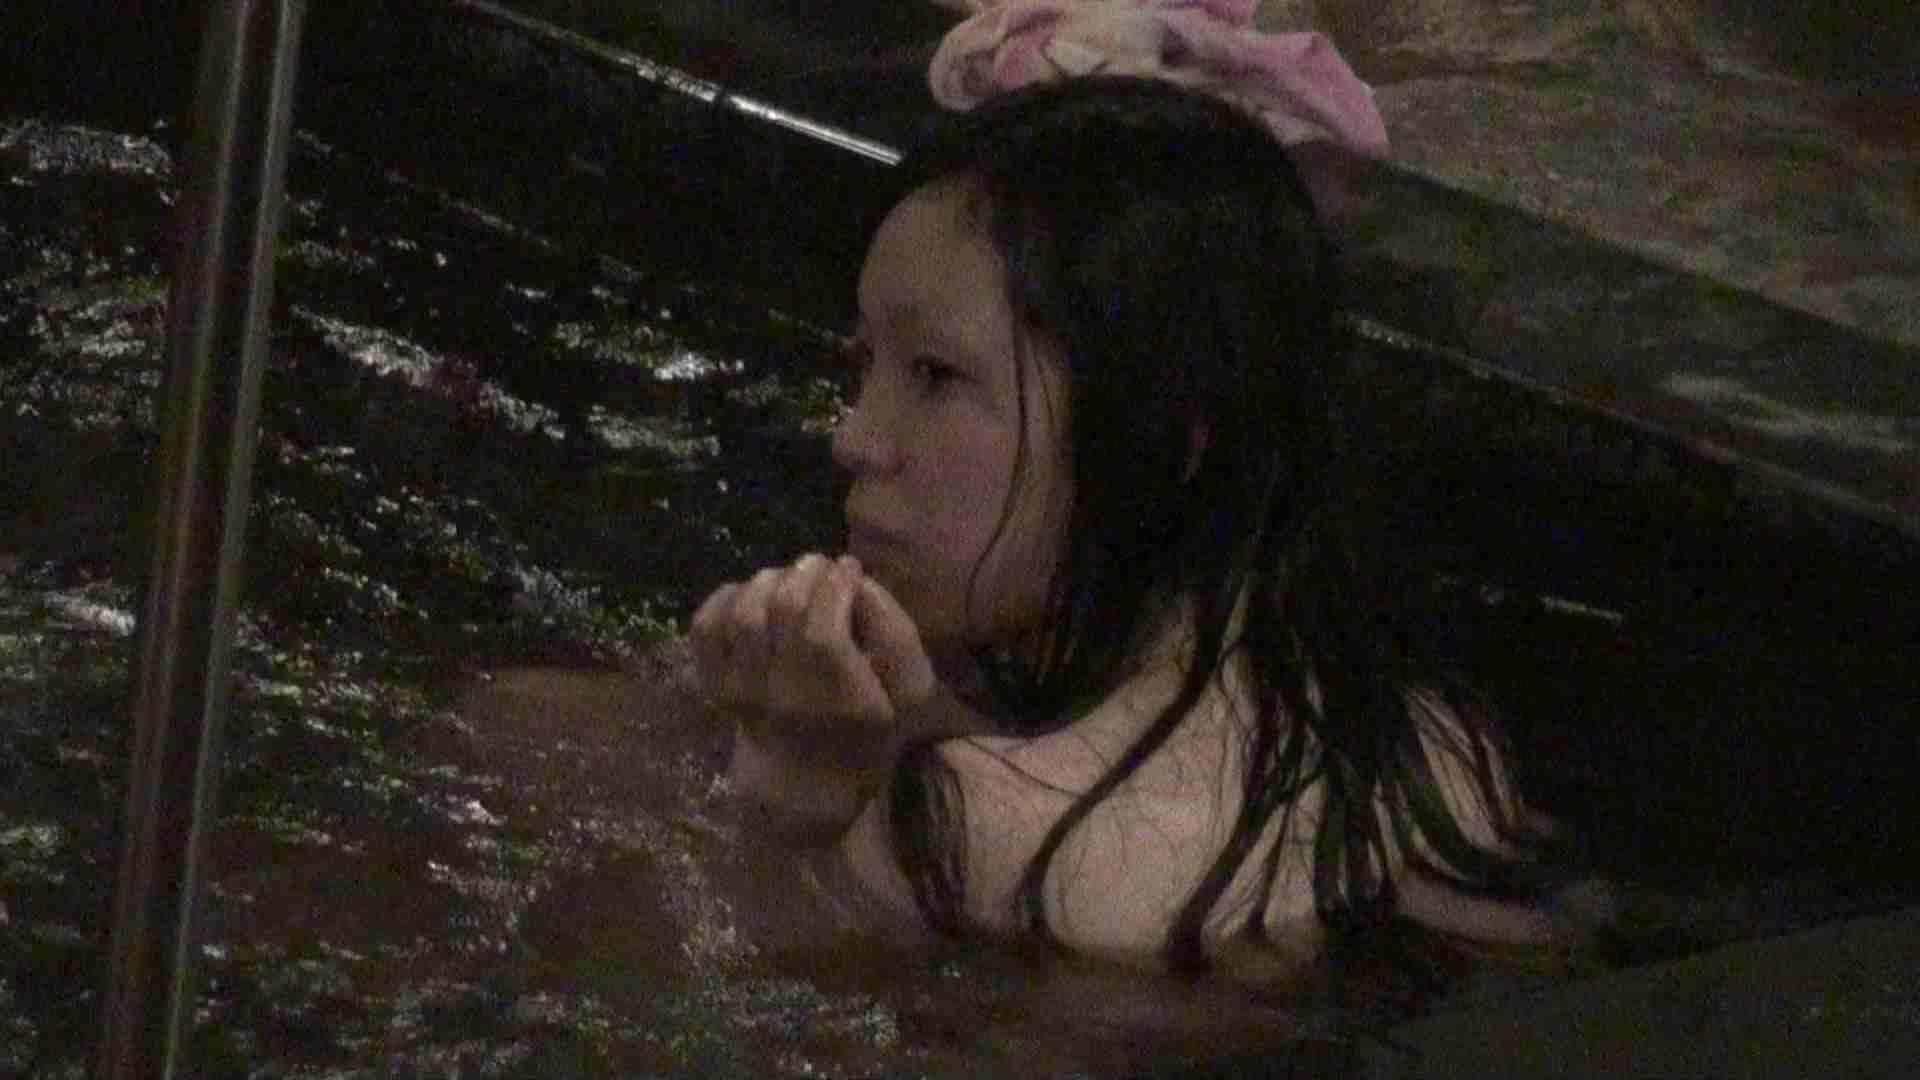 Aquaな露天風呂Vol.381 露天風呂突入 戯れ無修正画像 97pic 71